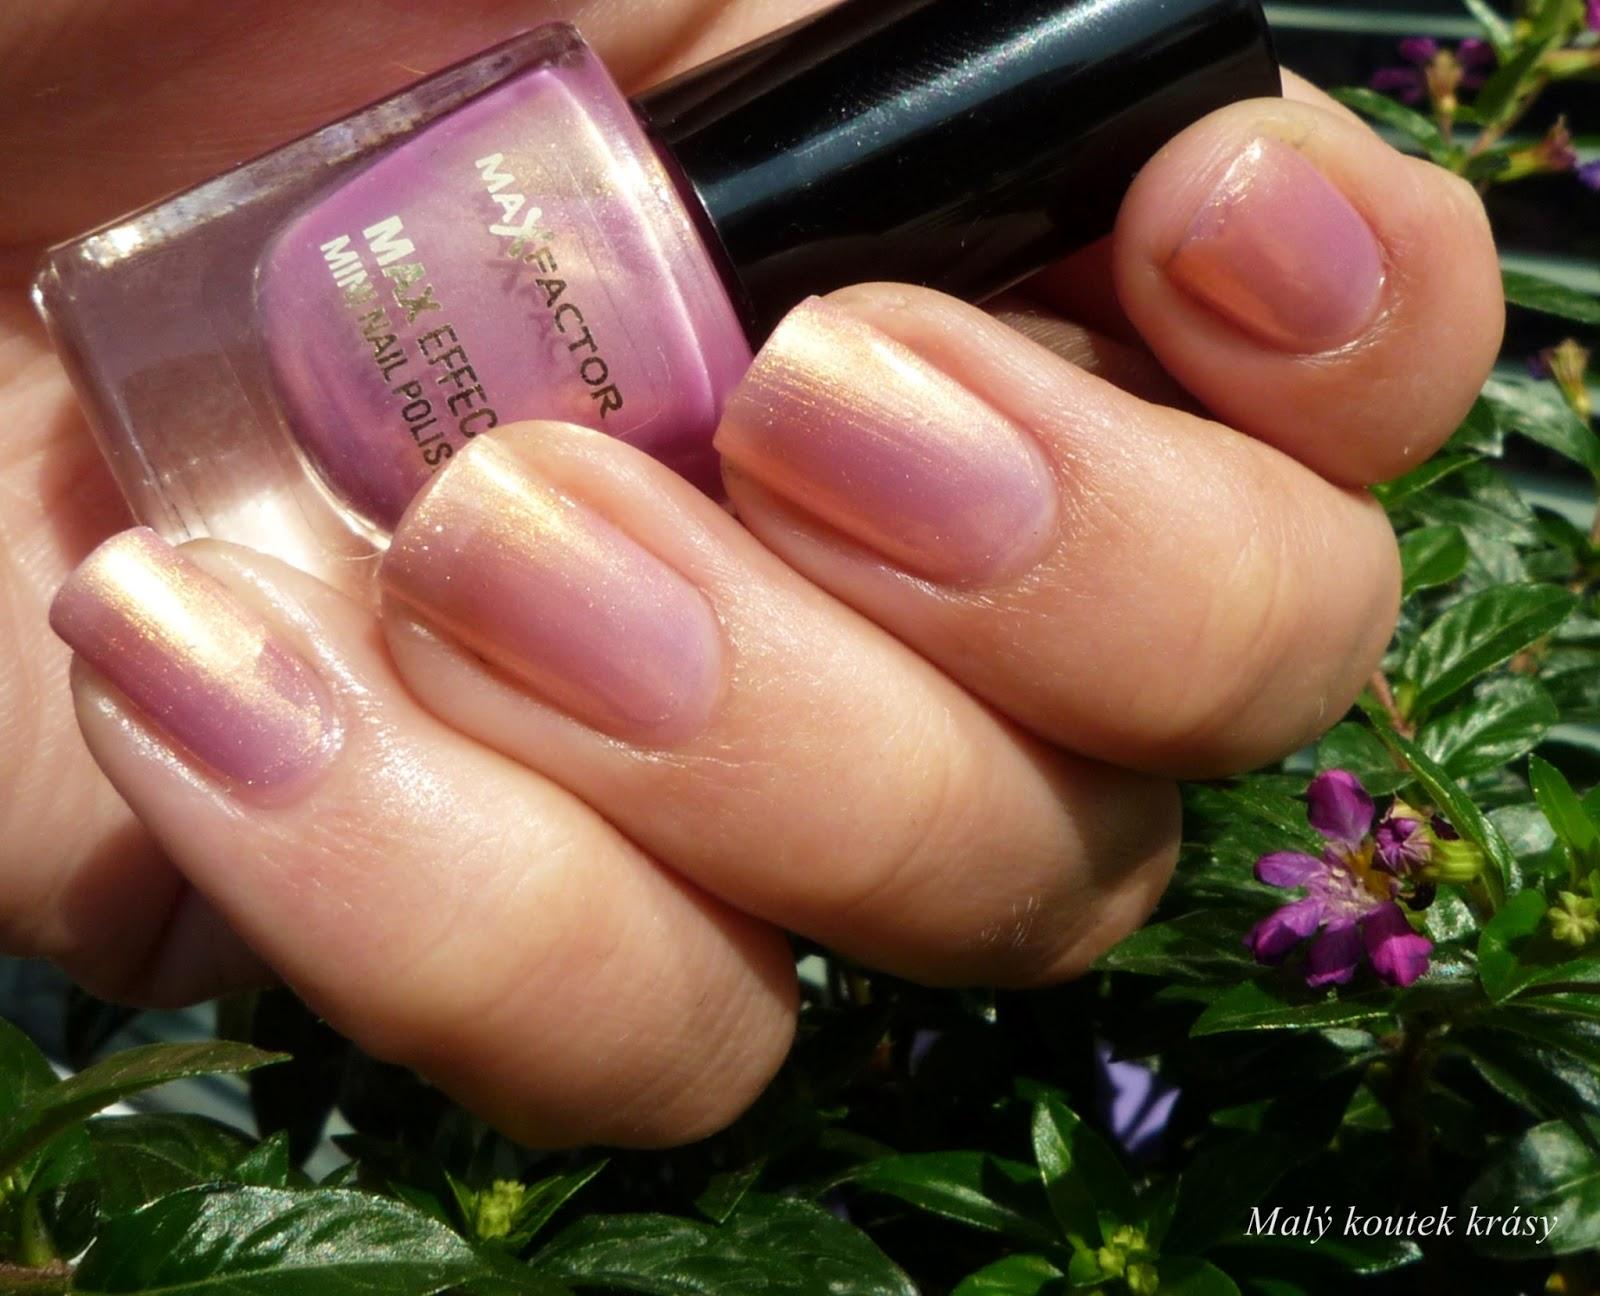 Maly Koutek Krasy Max Factor Max Effect Mini Nail Polish 05 Sunny Pink